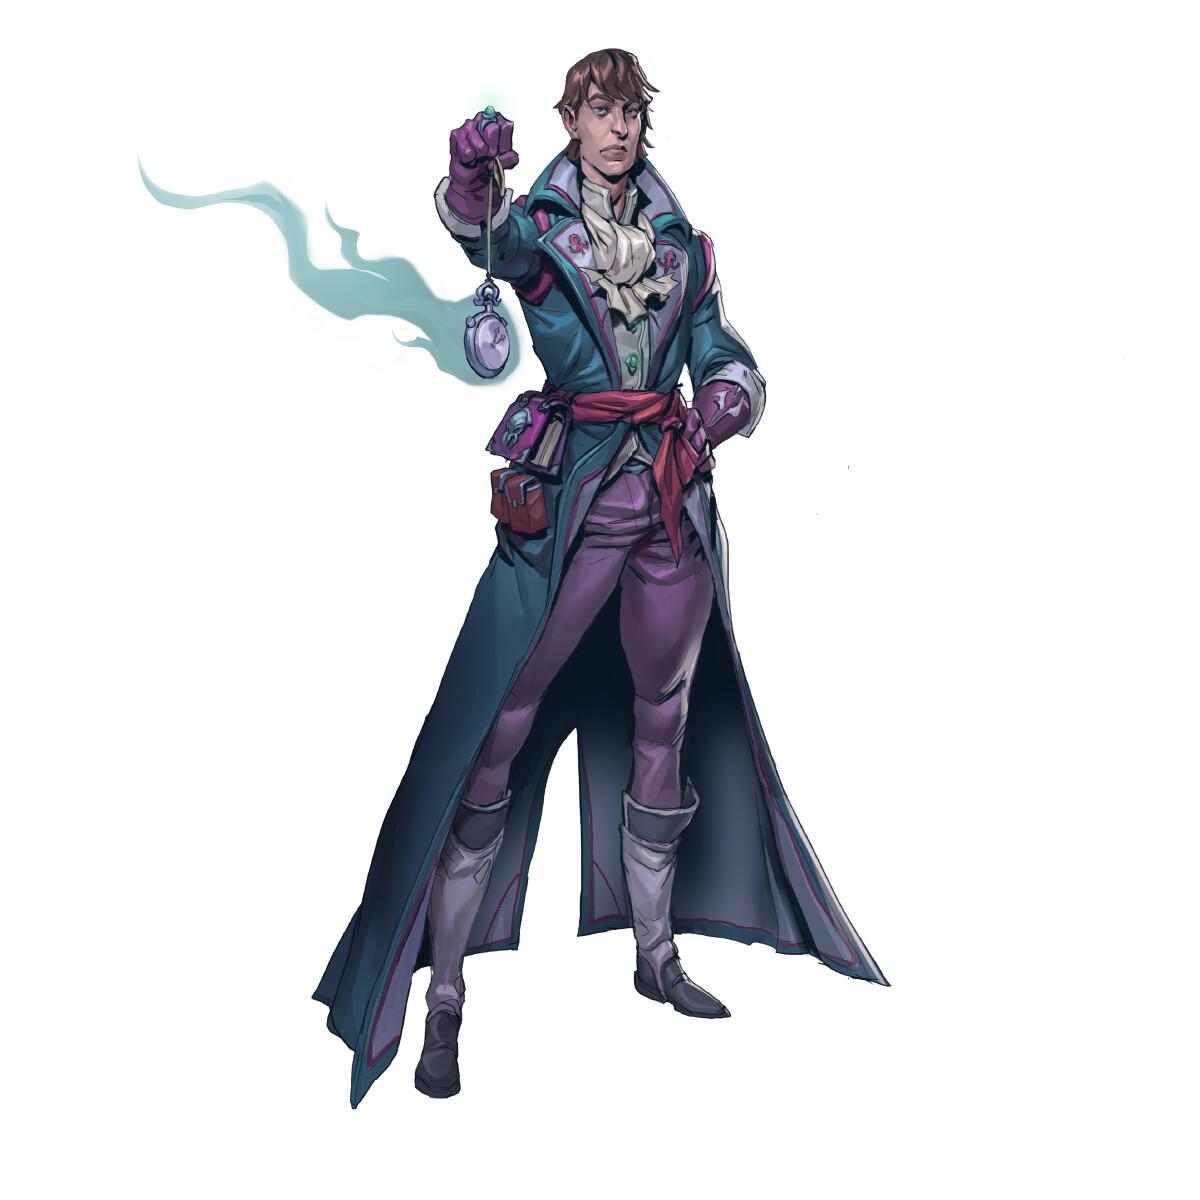 Jordy knoop lovecraft cleric final